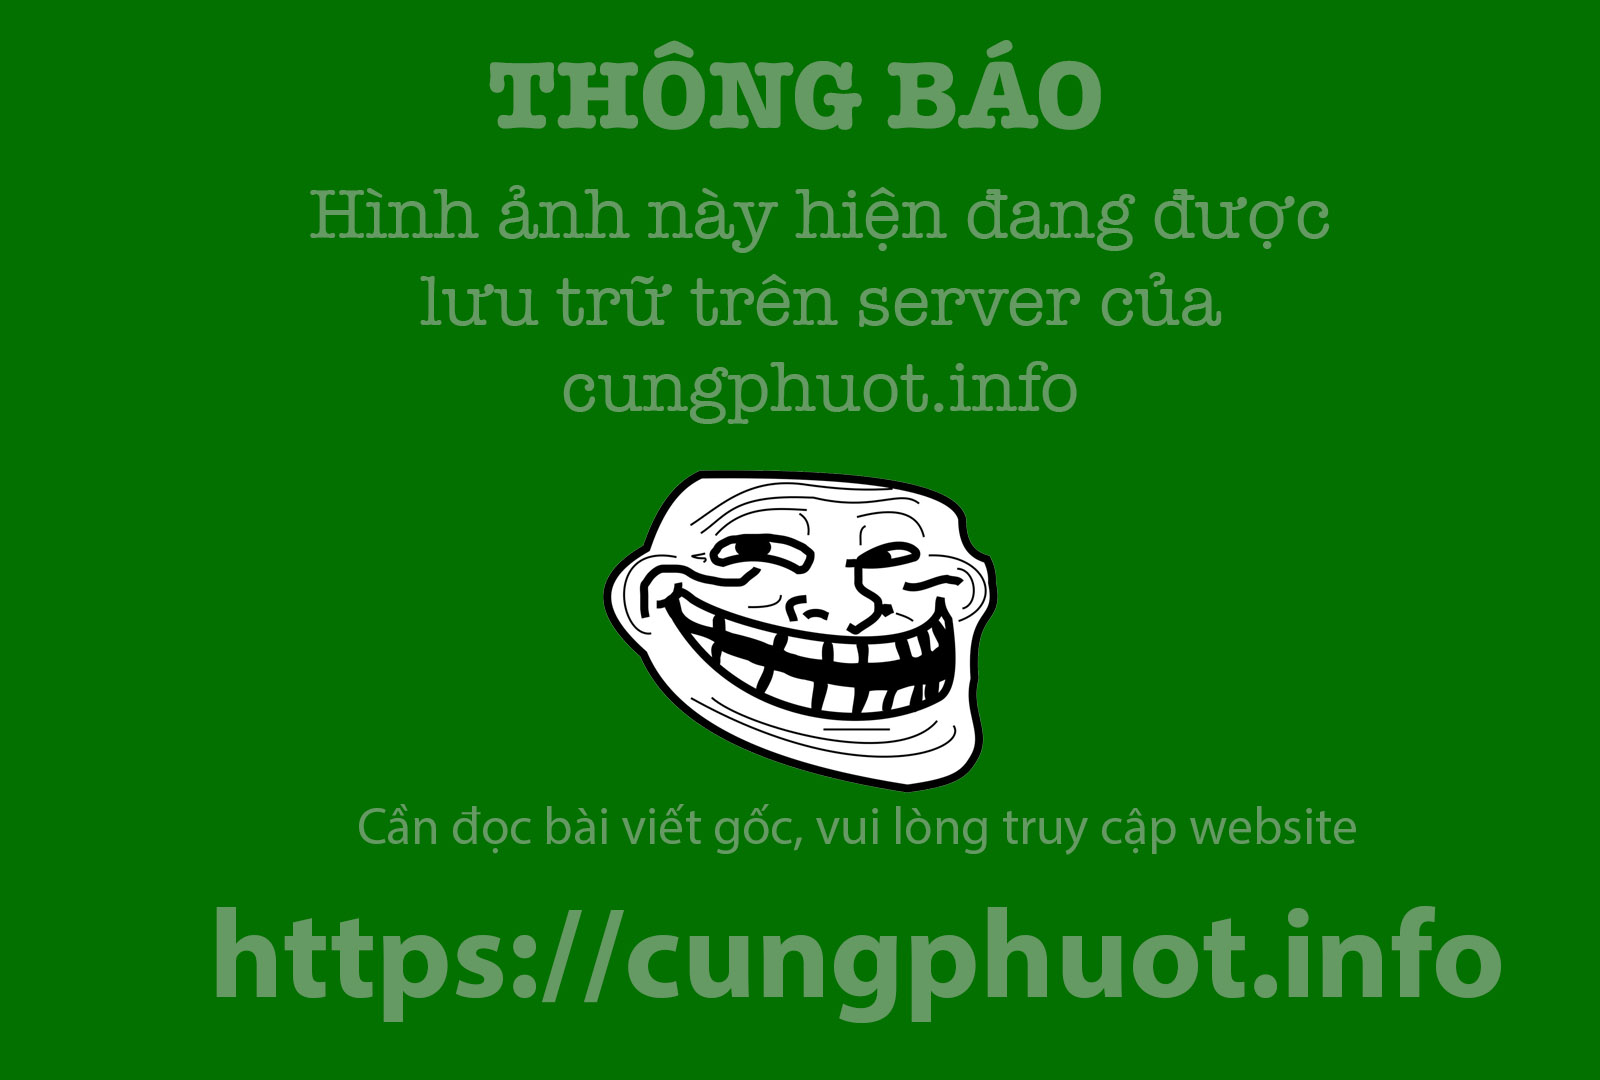 Vuon hoa tam giac mach o Ninh Binh hinh anh 1